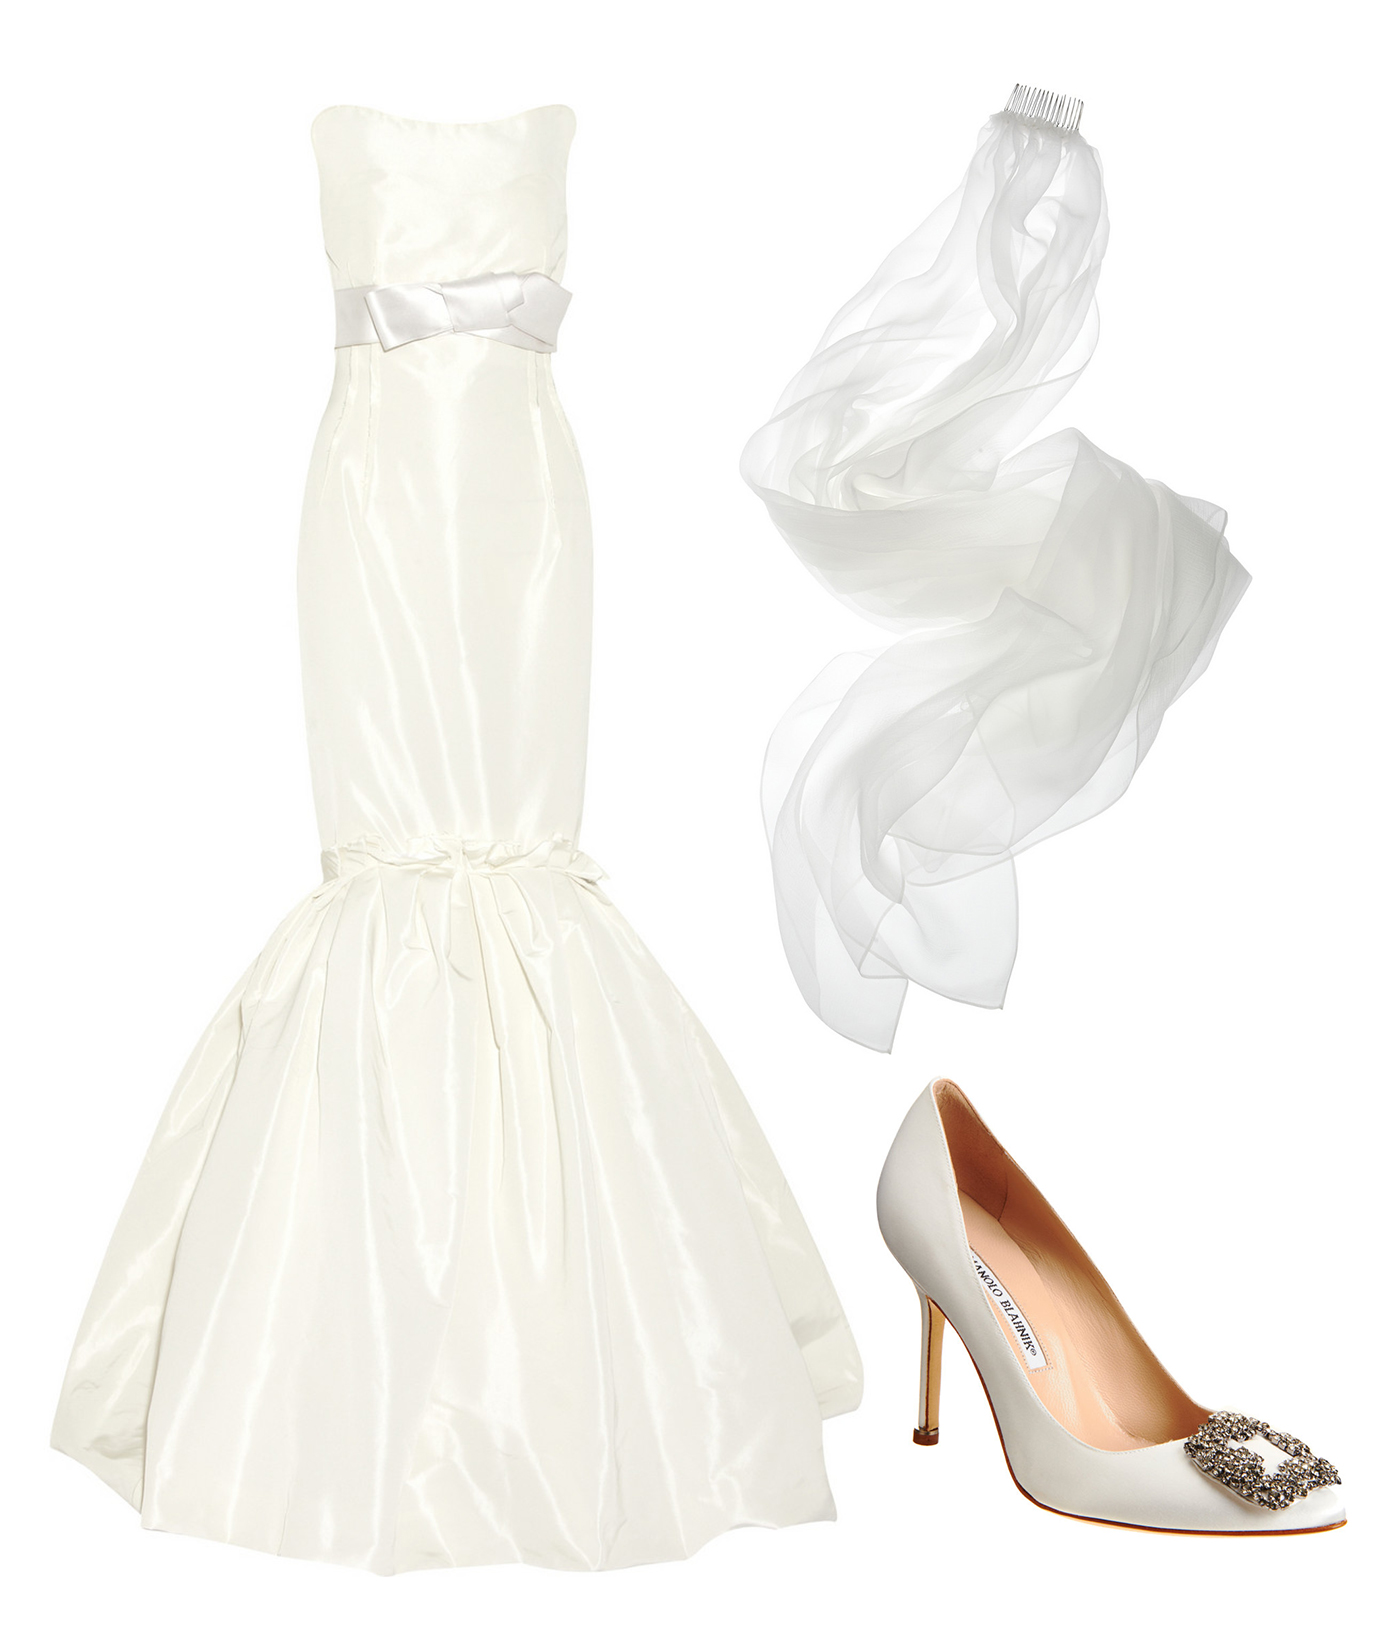 spring-wedding-dresses-accessories-26.jpg